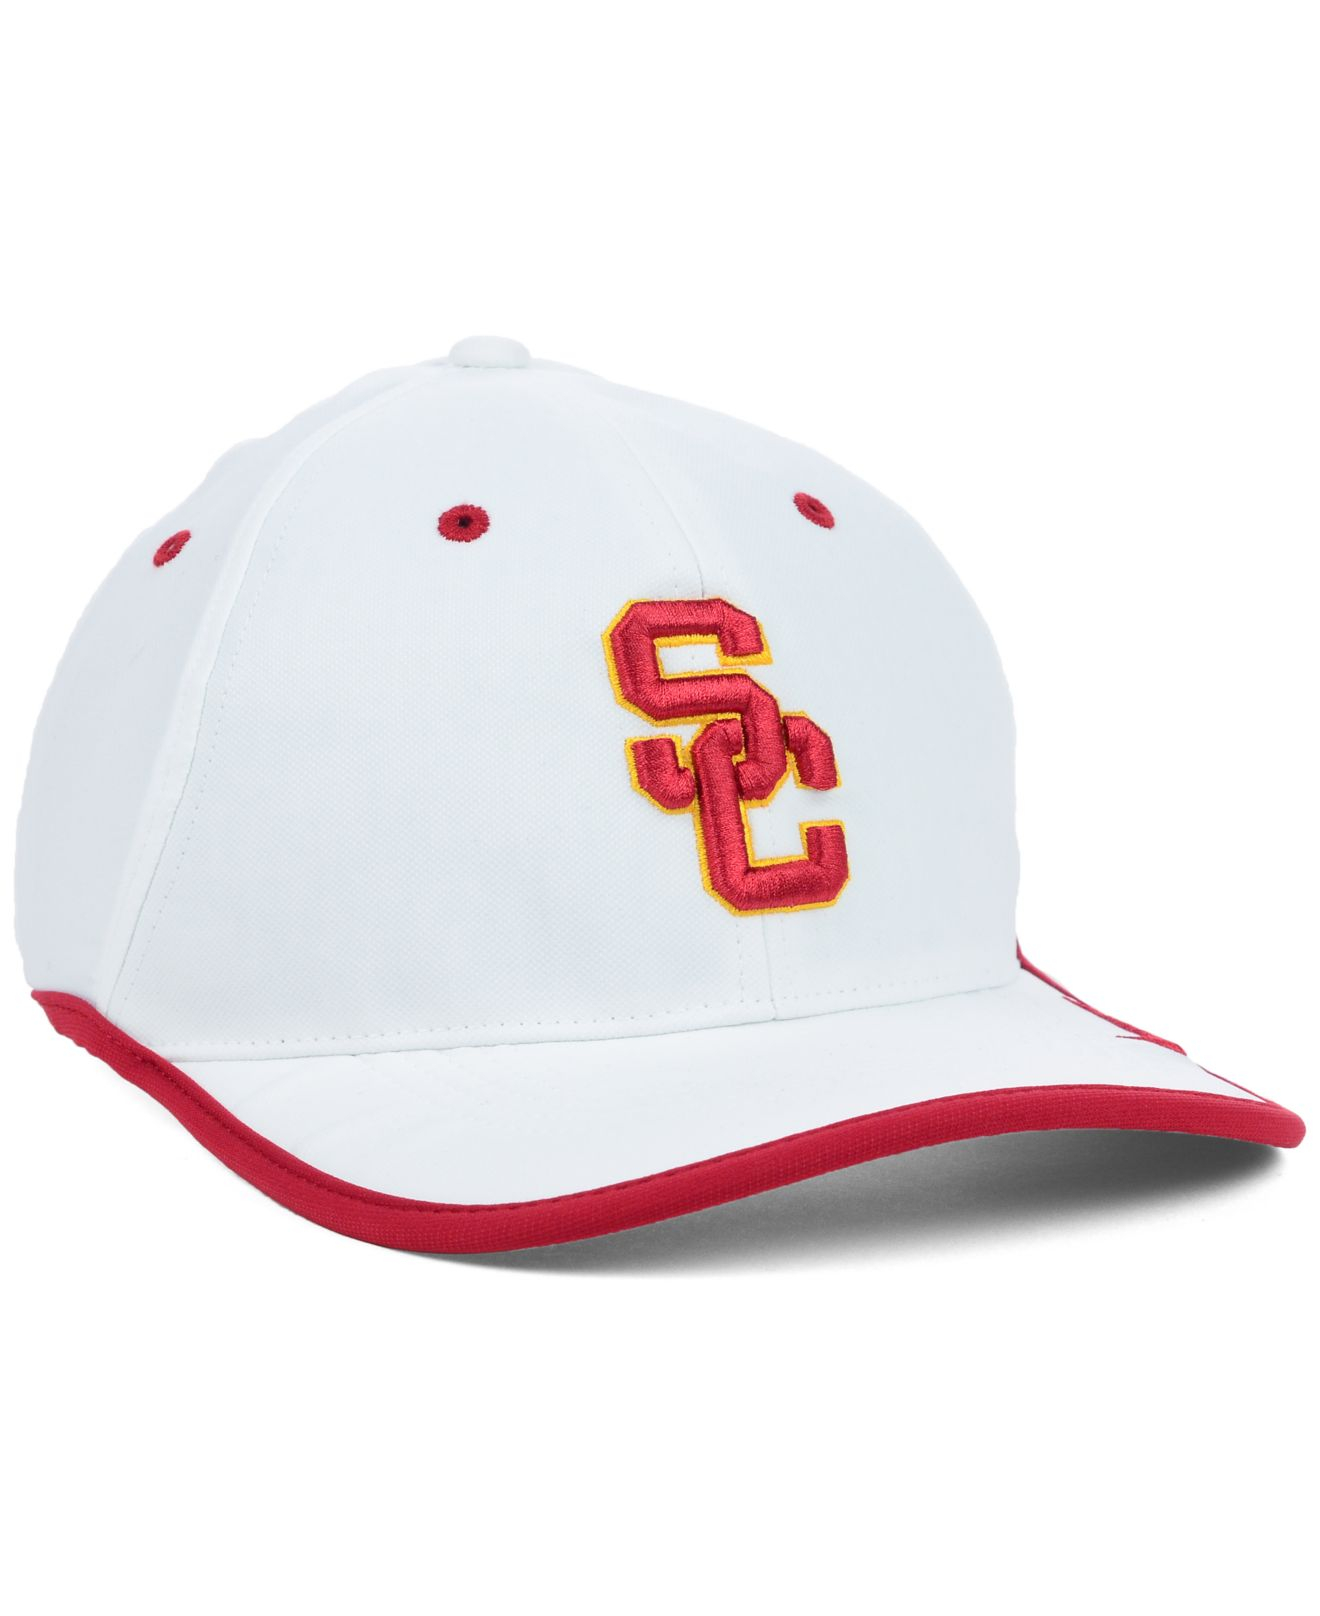 9084e648a18a6 shop usc white baseball hat 747aa d6c0a  italy lyst nike usc trojans  coaches dri fit cap in white for men 0b032 6f903